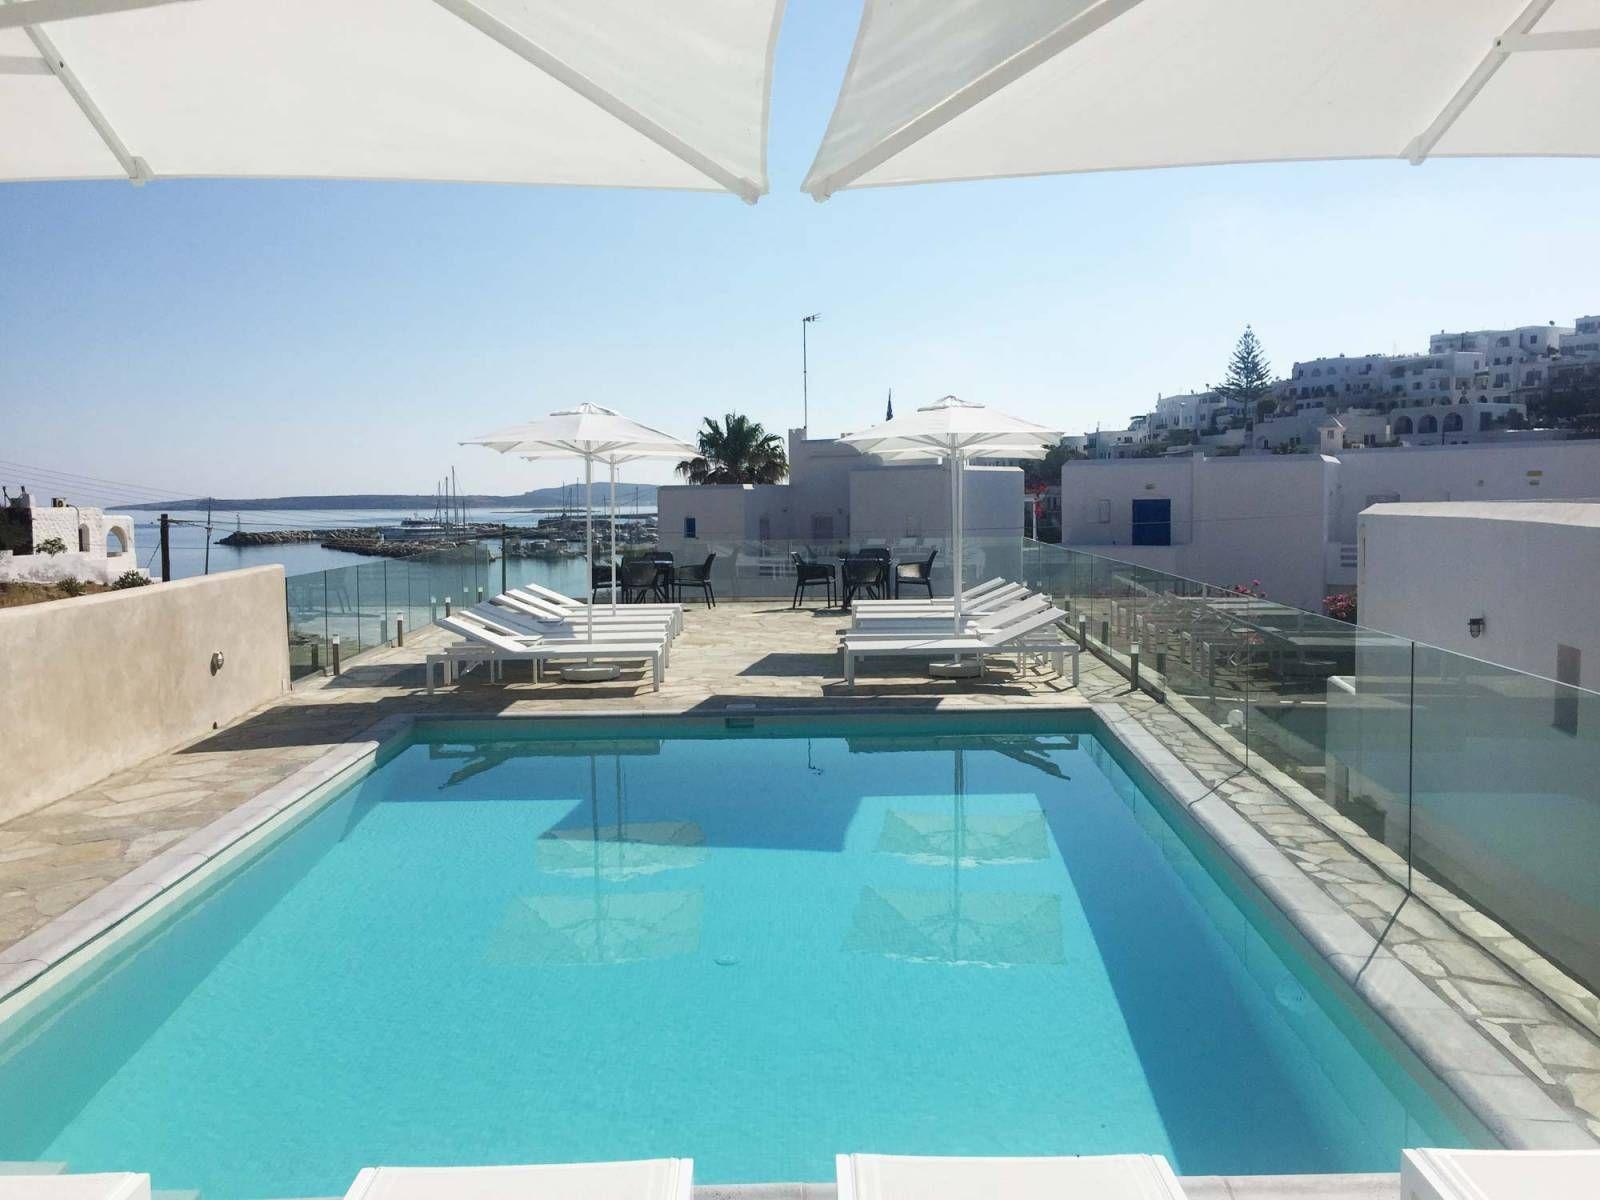 Adonis Hotel & Apartments - Πάρος ✦ 2 Ημέρες (1 Διανυκτέρευση) ✦ 2 άτομα ✦ Πρωινό ✦ έως 30/06/2021 ✦ Κοντά στην Παραλία!